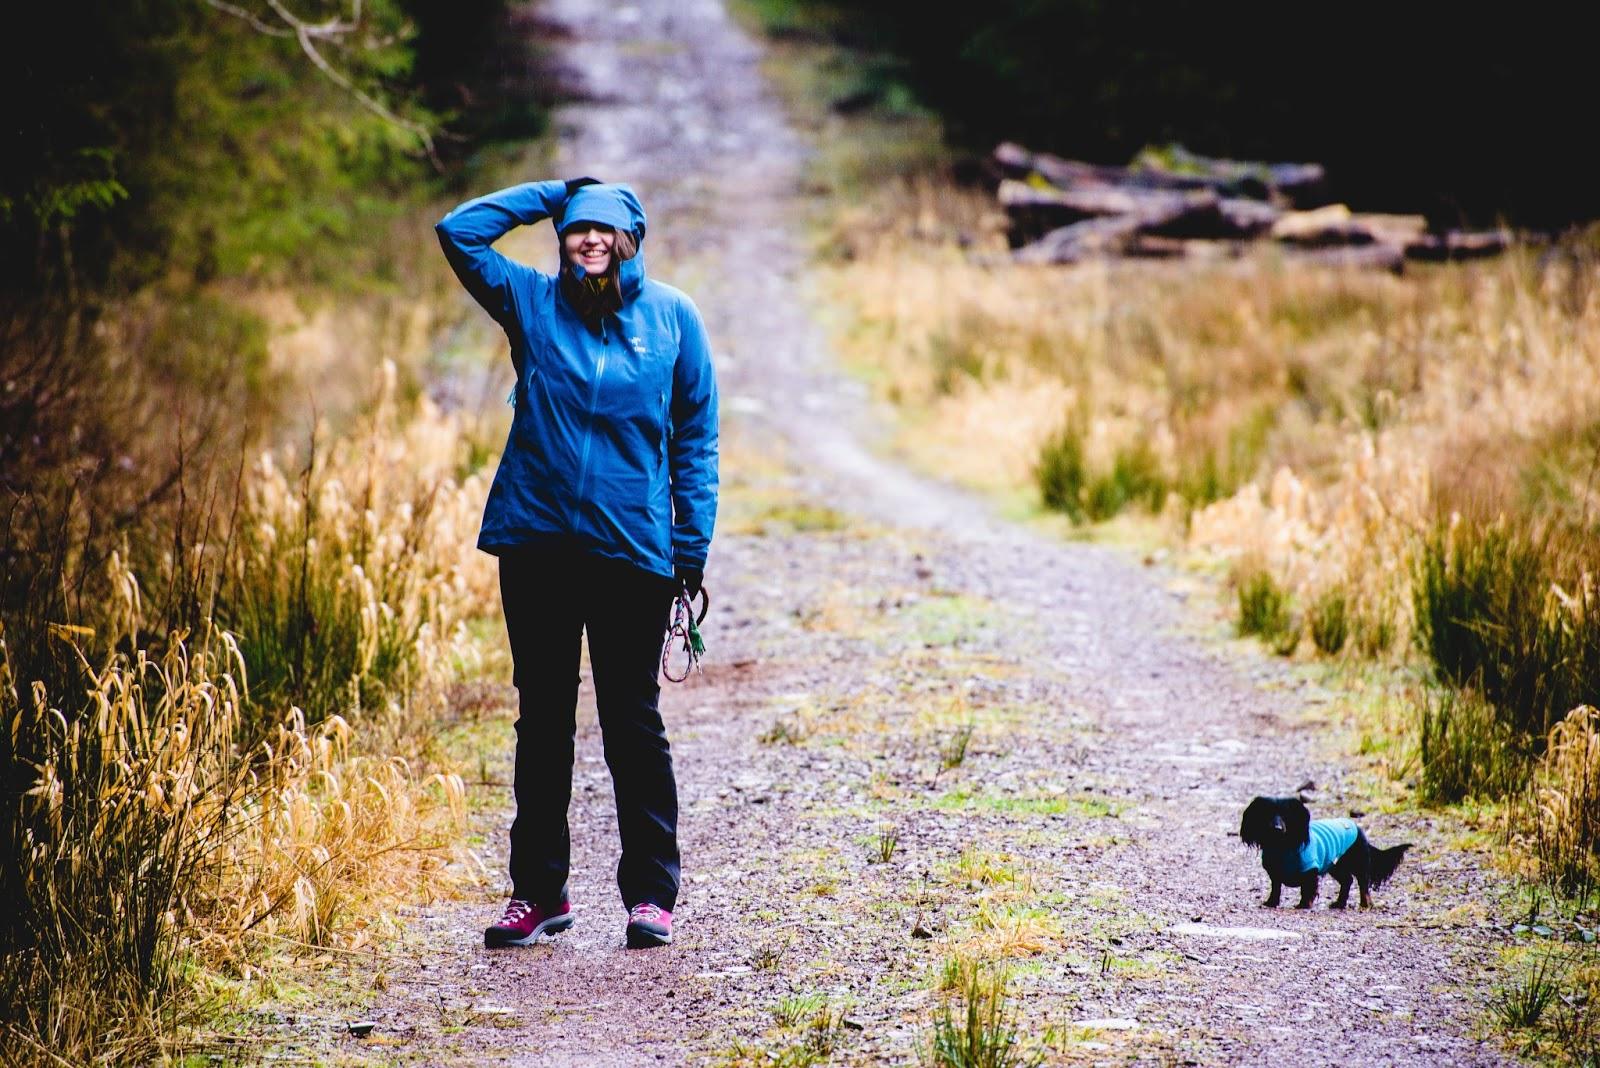 outdoorsy af liquid grain liquidgrain arcteryx dachshund goretex